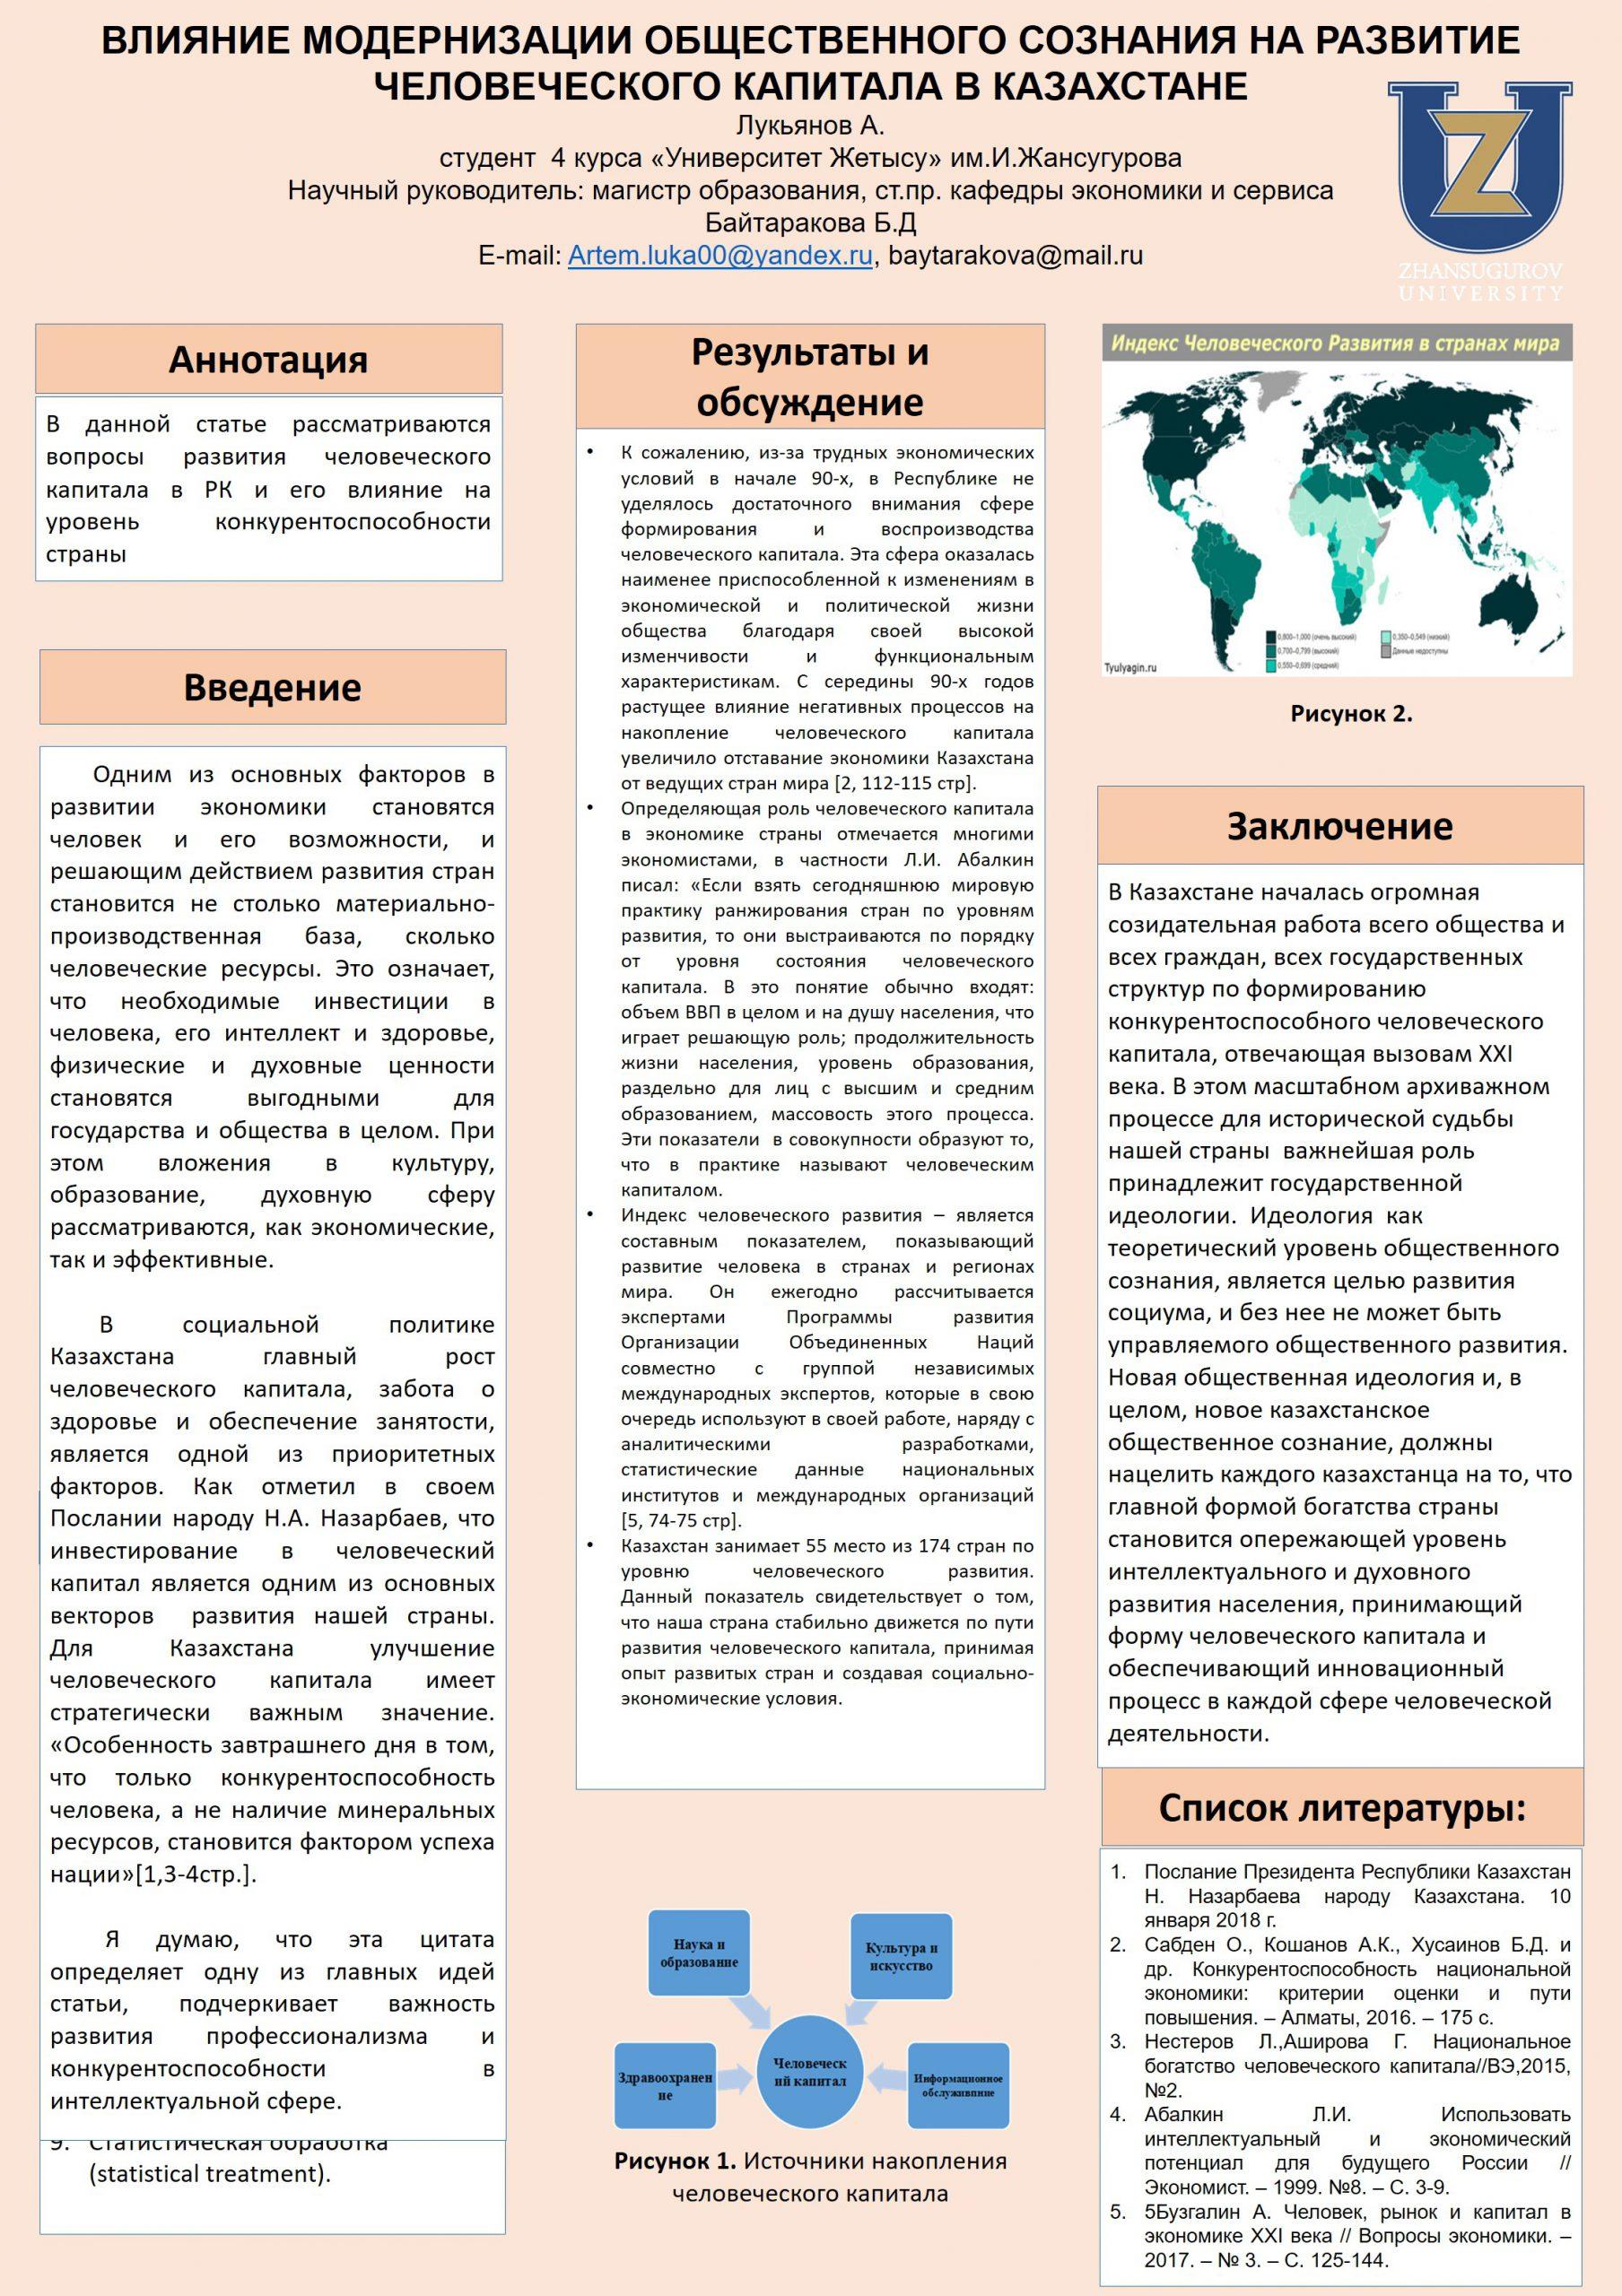 1-место-Лукьянов-scaled